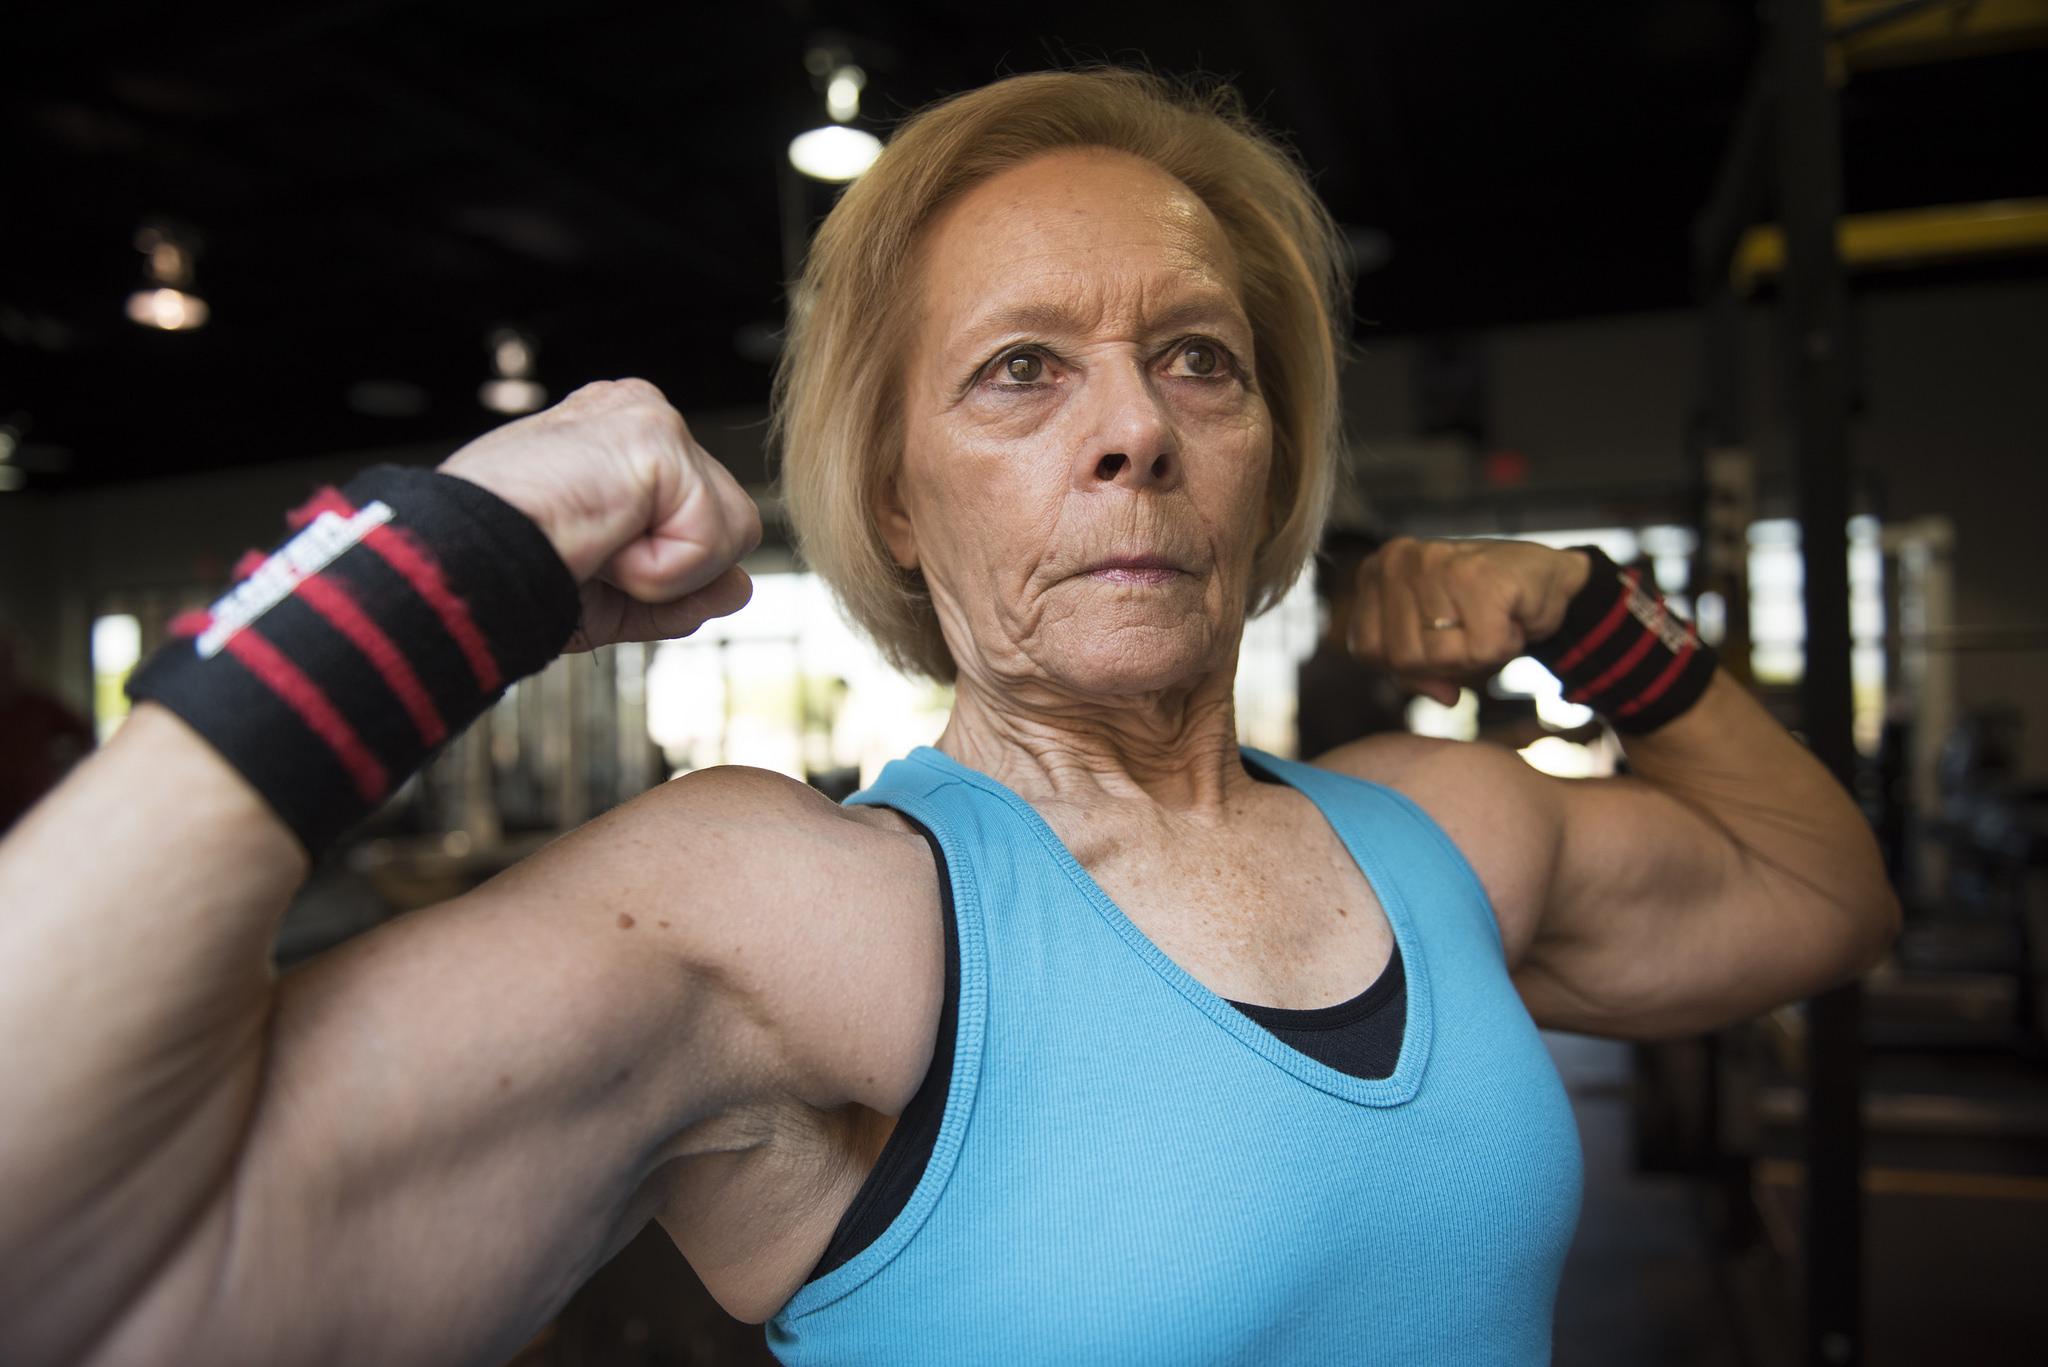 76-year-old powerlifter Joan Schmidt flexes following a workout at Iron Addicts LV in Las Vegas, Tuesday, Oct. 25, 2016. Jason Ogulnik/Las Vegas Review-Journal